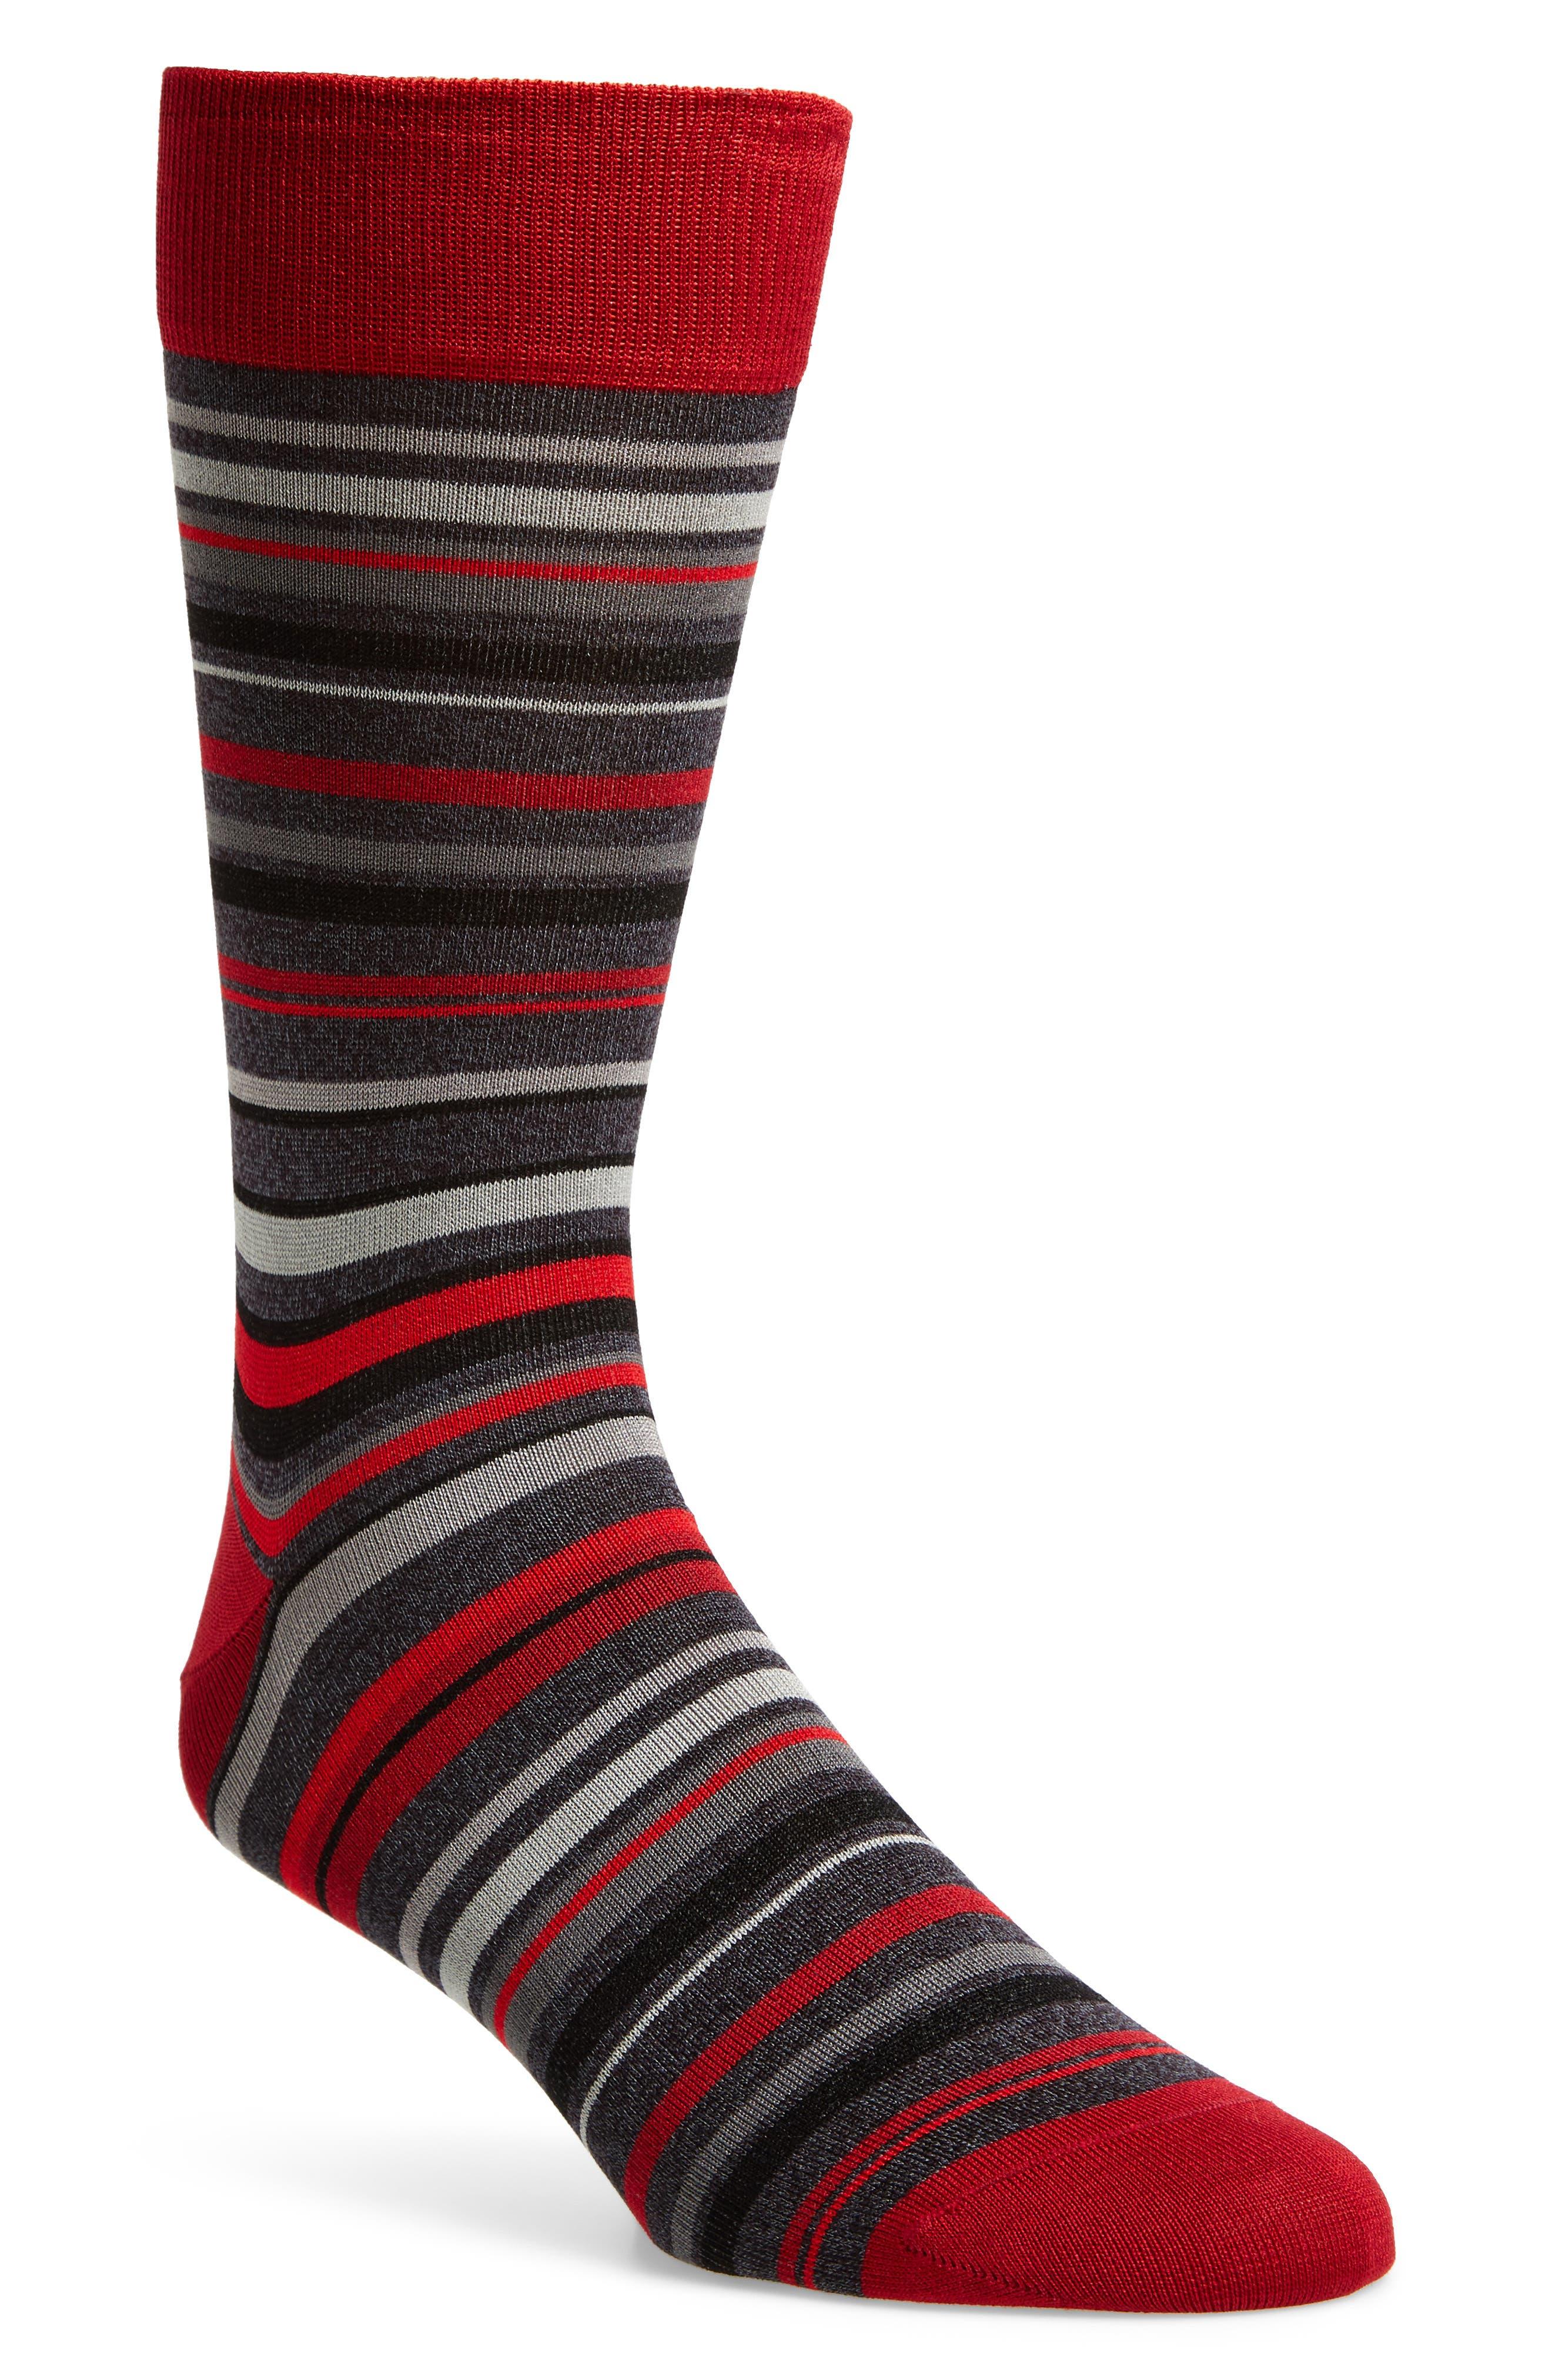 Alternate Image 1 Selected - Bugatchi Multi Stripe Crew Socks